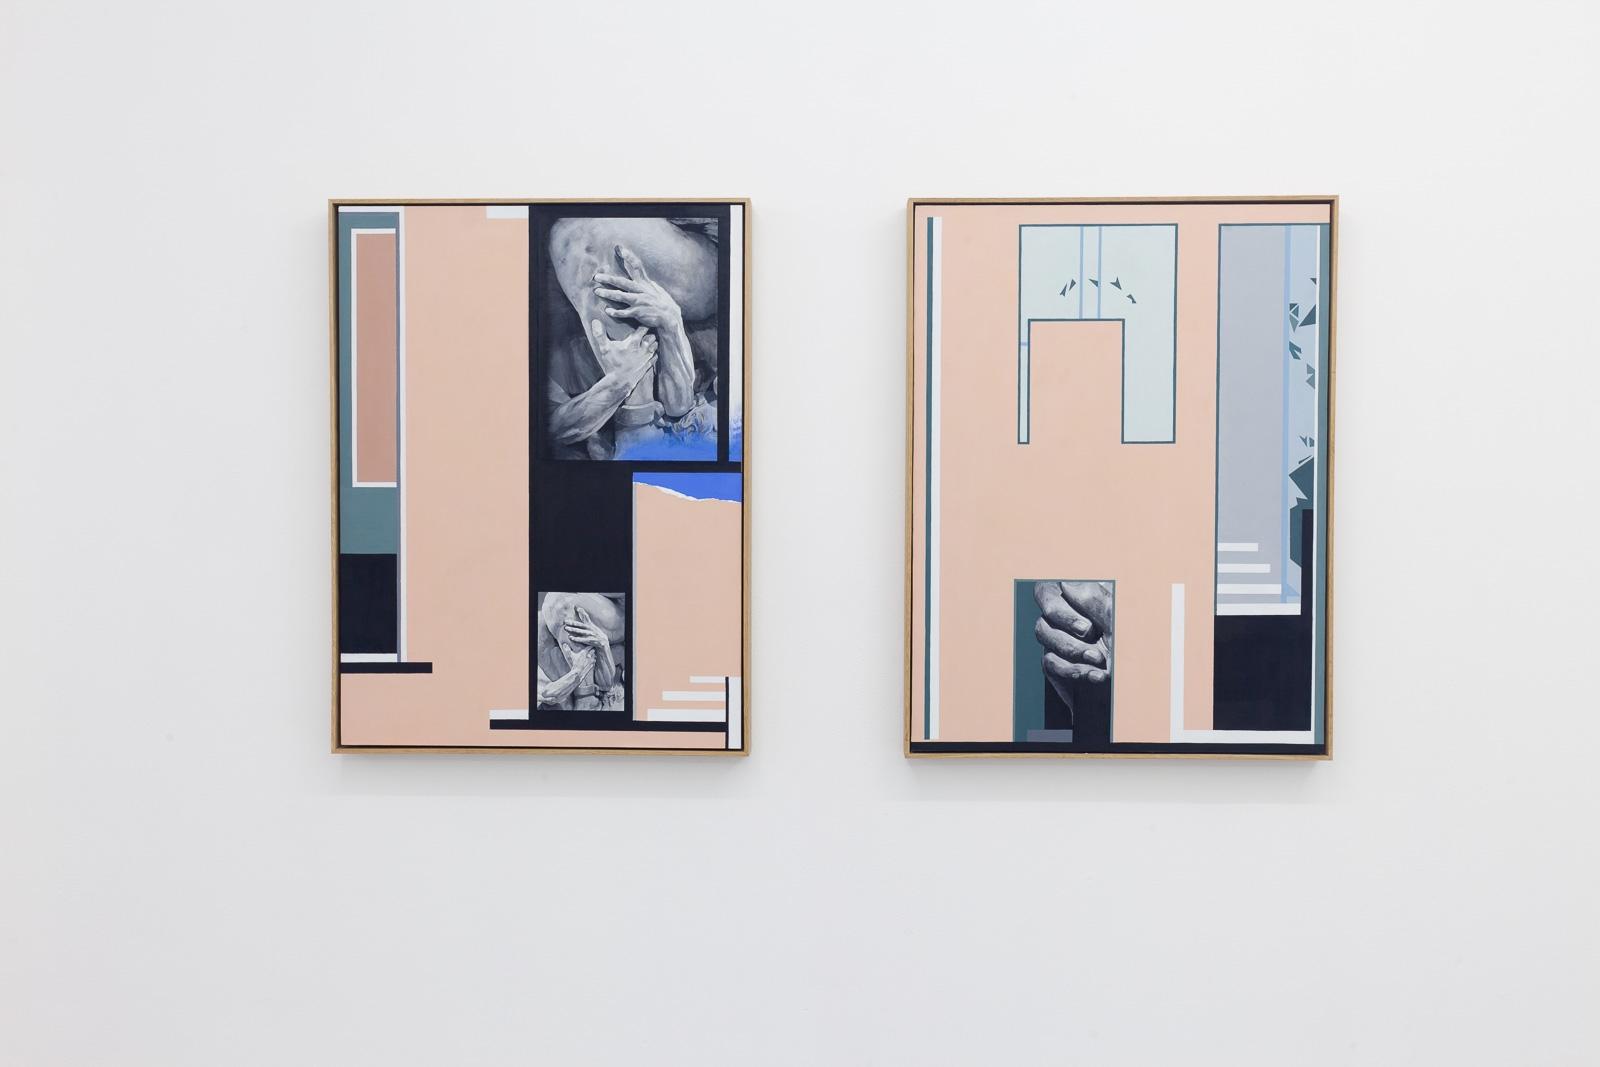 Genevieve Felix Reynolds, installation view image